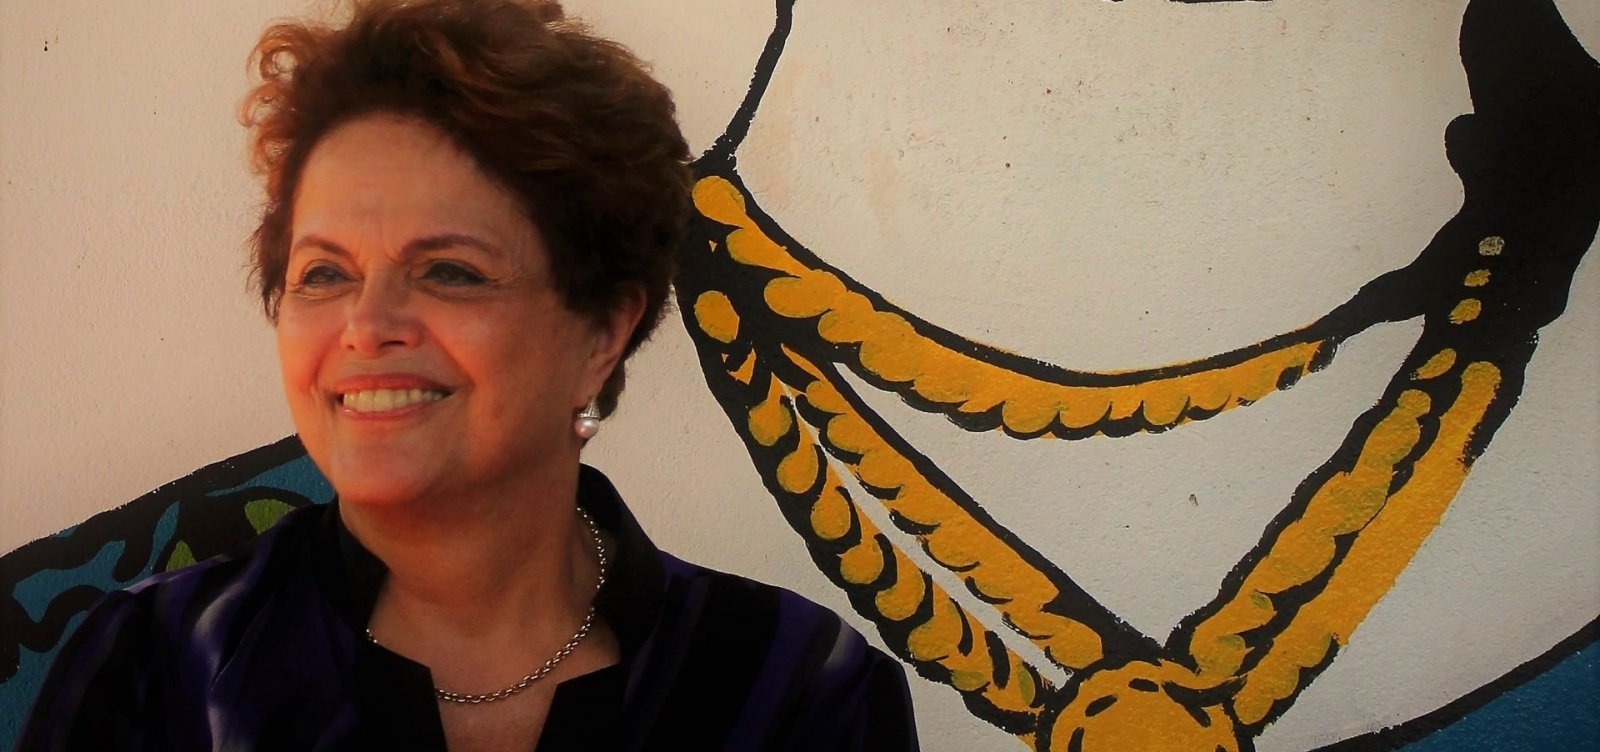 Por unanimidade, TCU inocenta Dilma Rousseff por prejuízo com compra de Pasadena